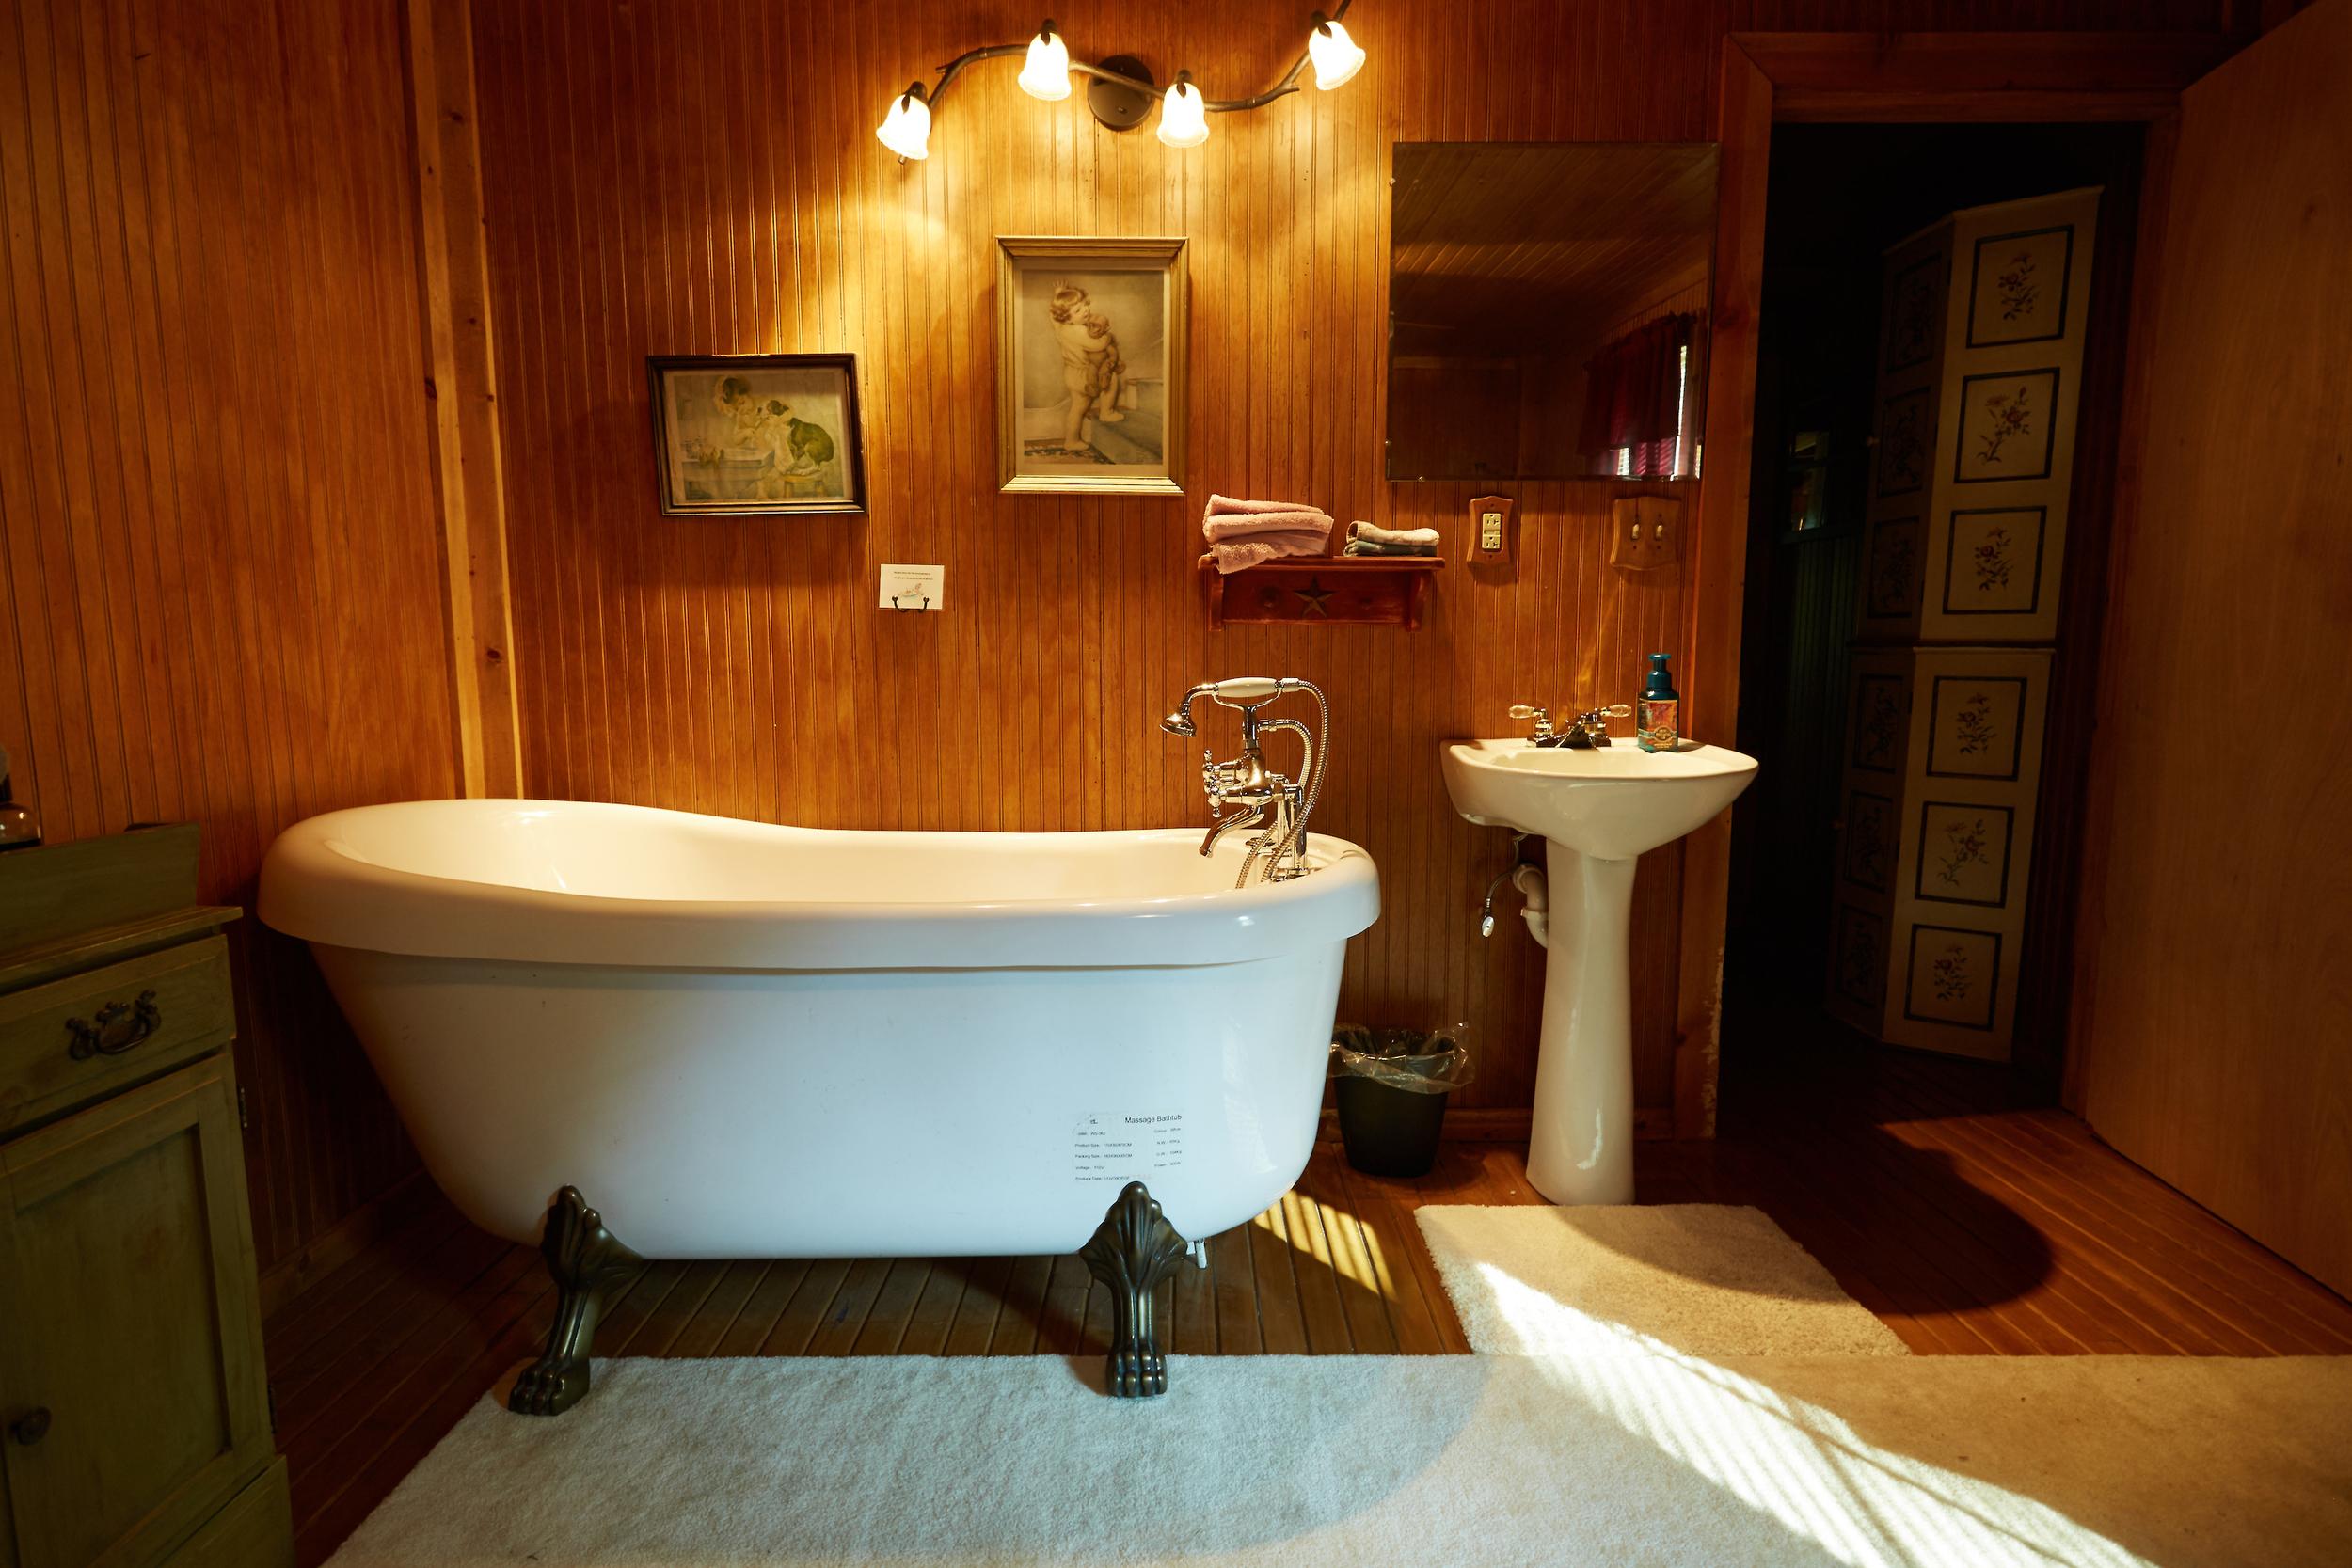 Clawfoot Tub in Charming Master Bedroom.